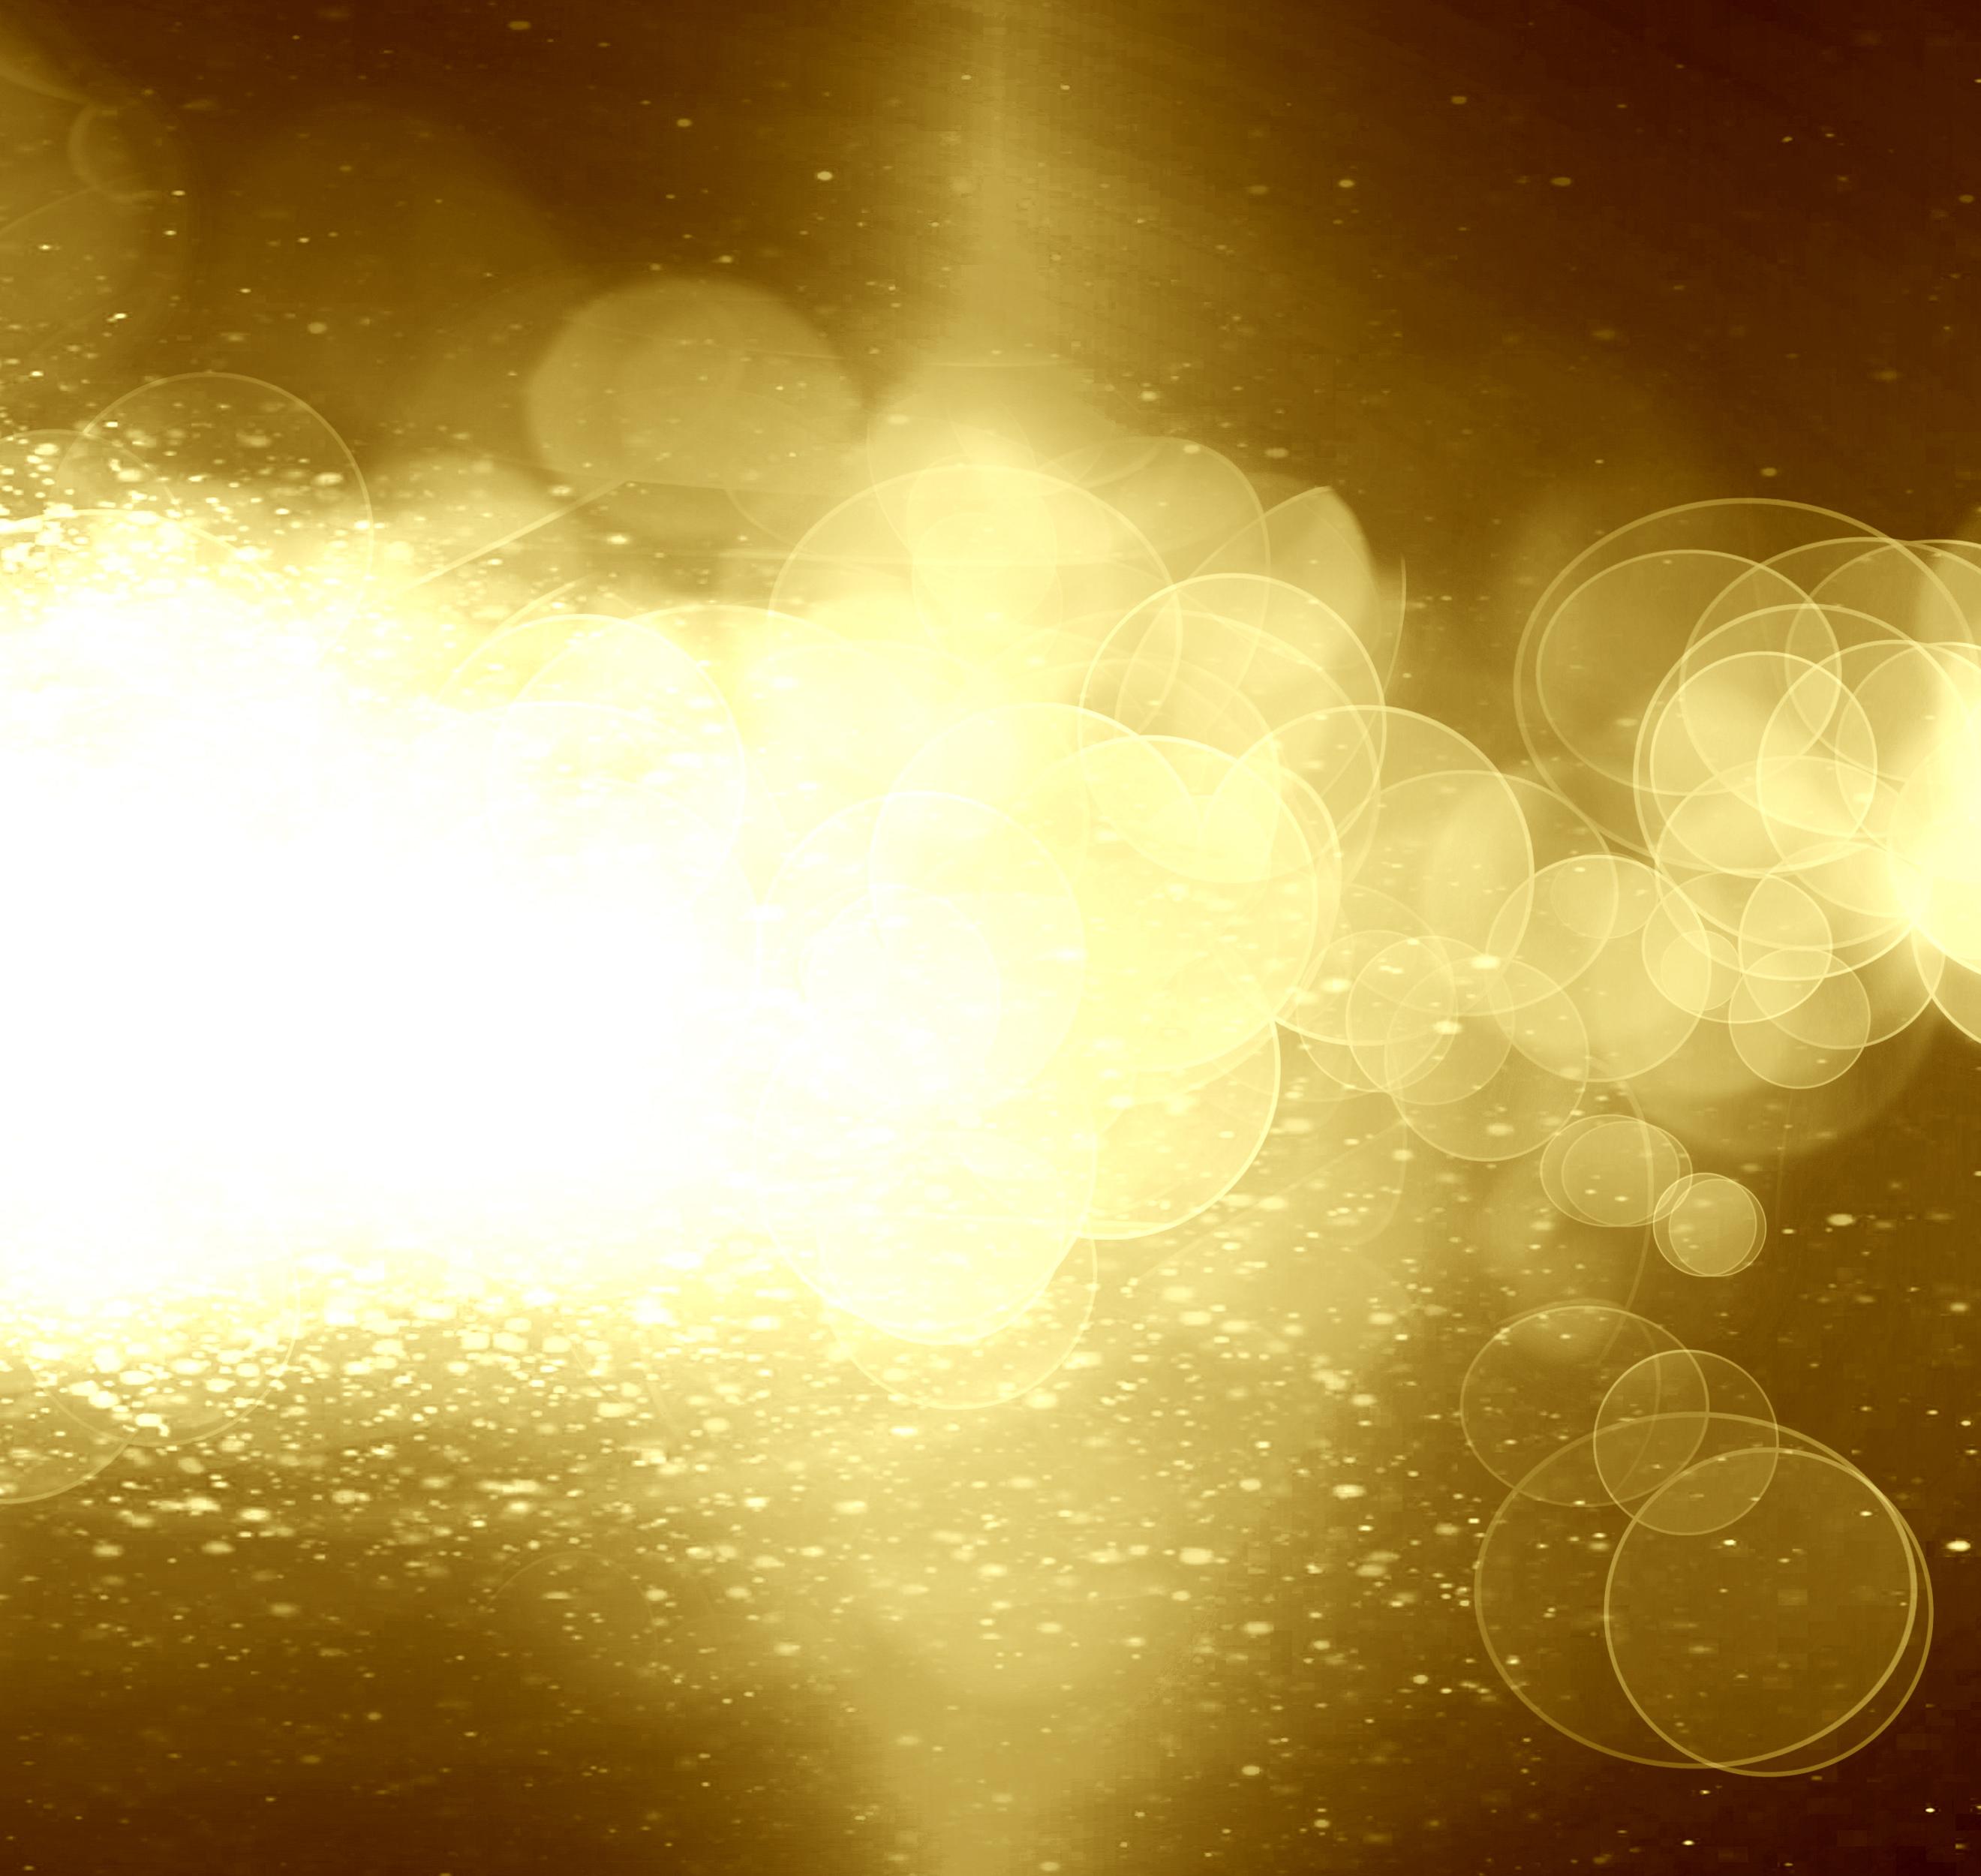 Golden glitter background by arghusjpg 2640x2500